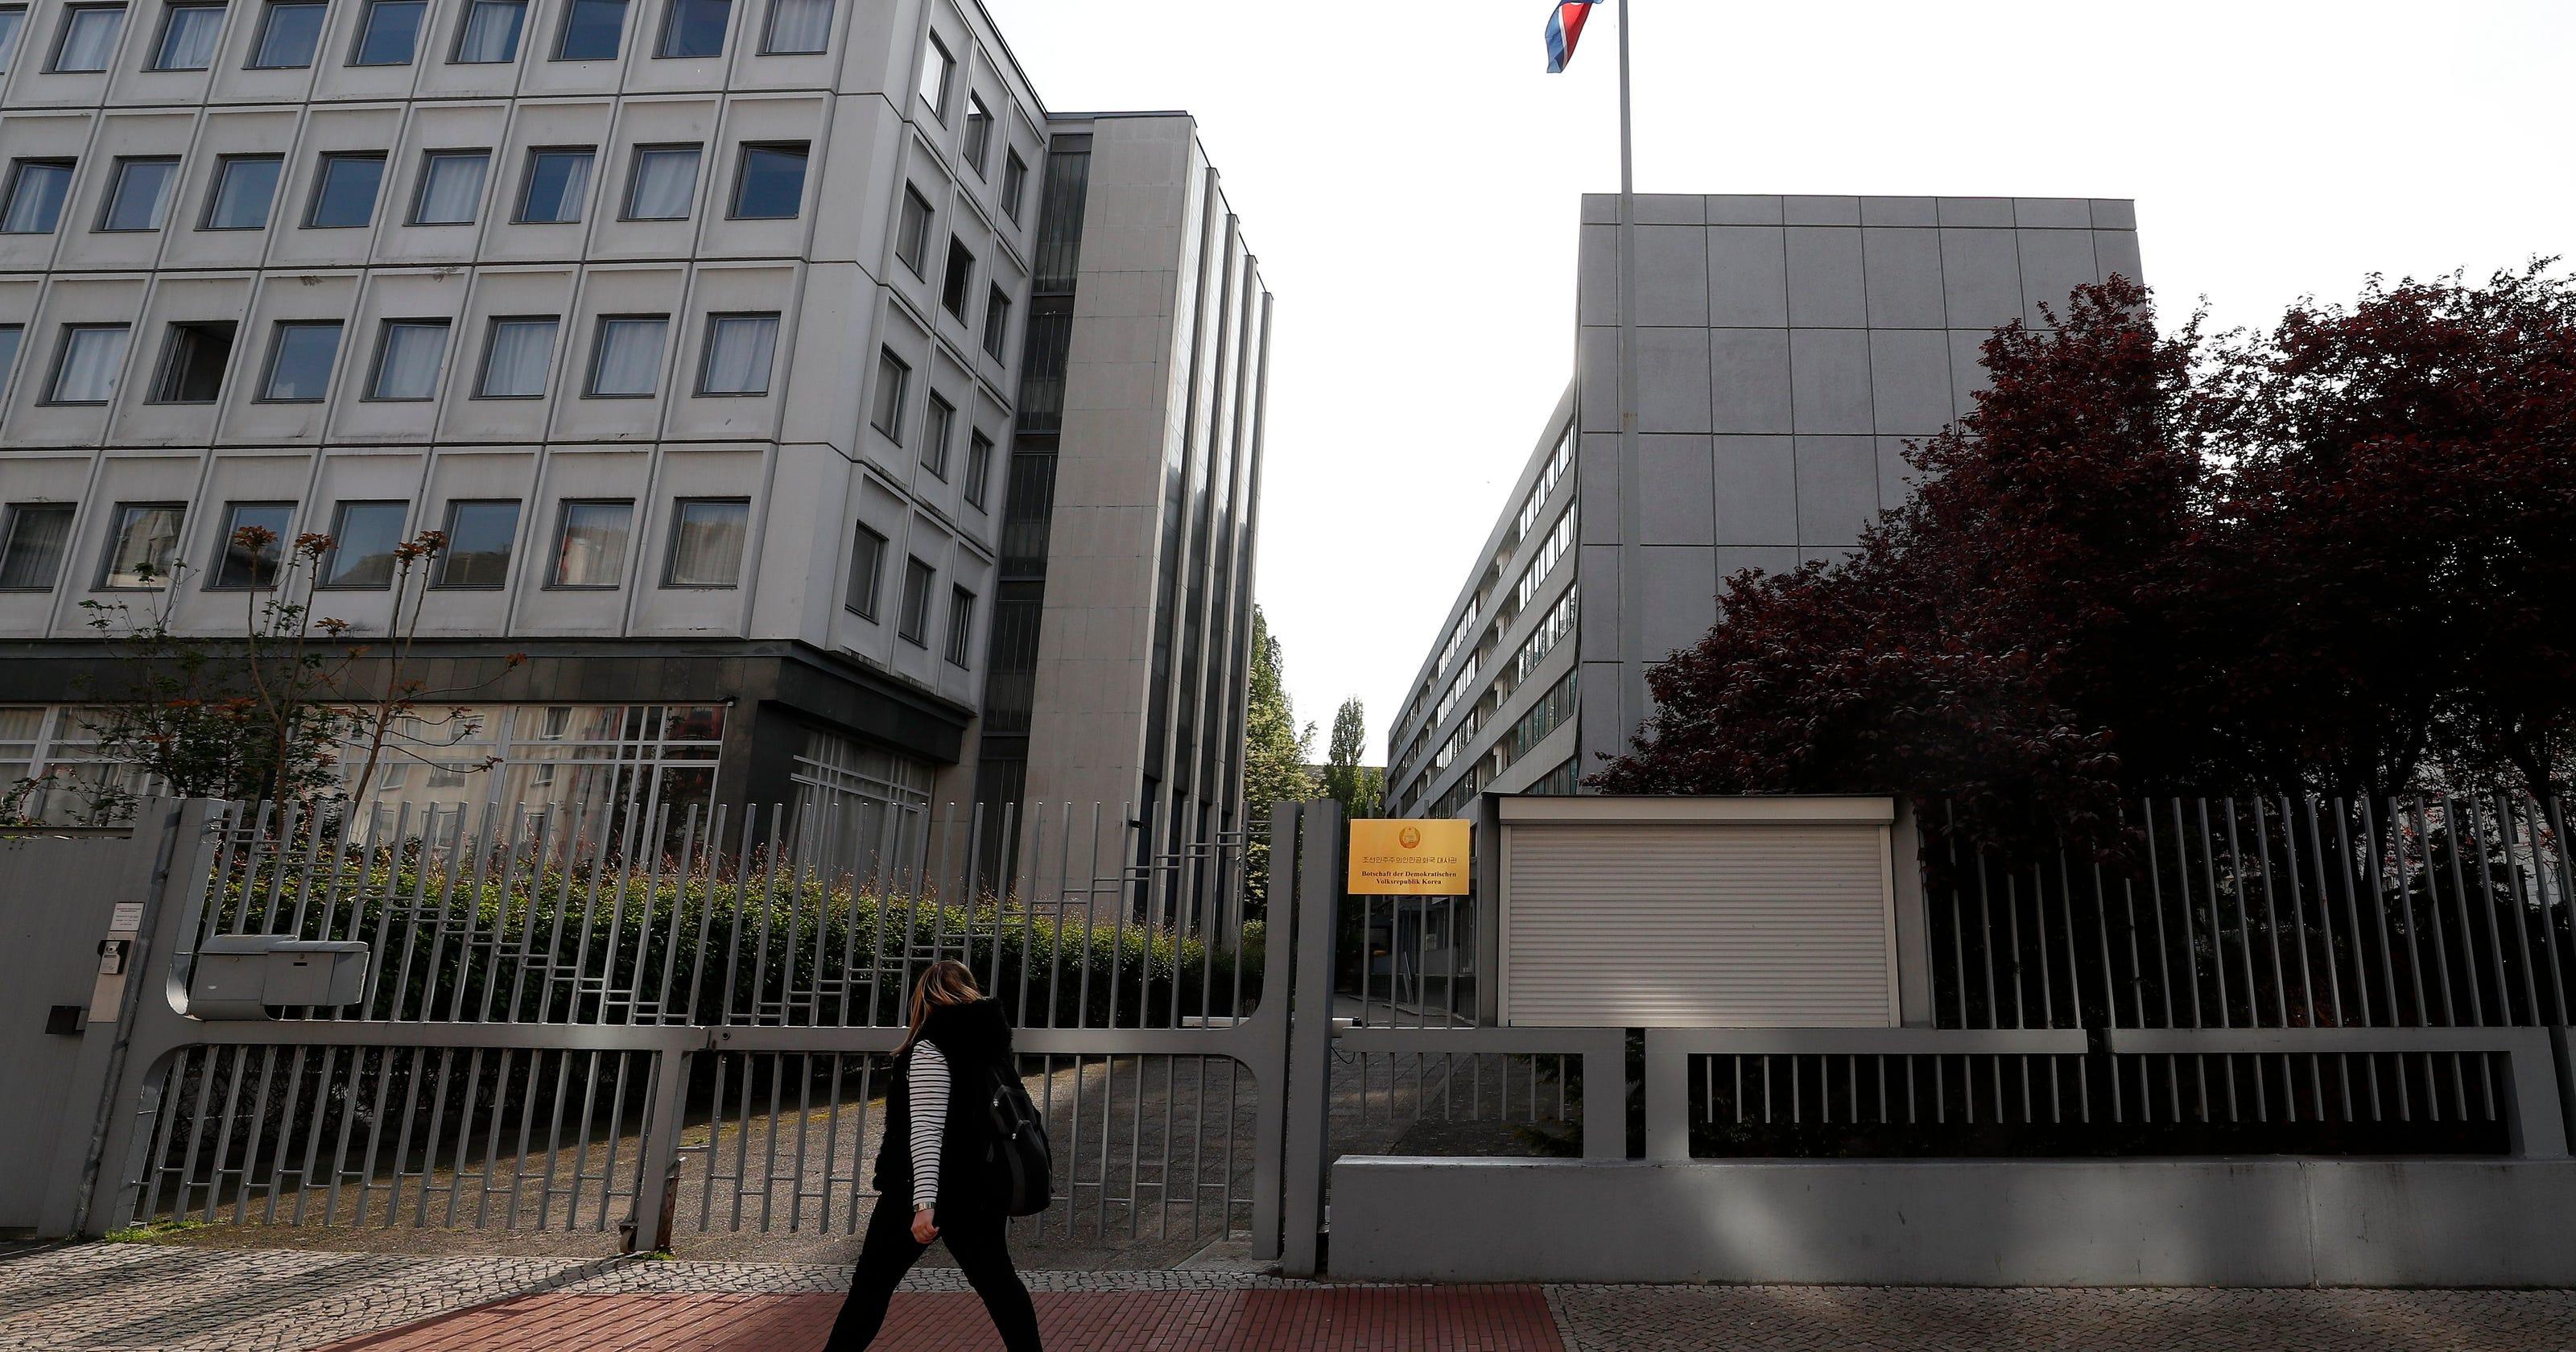 b70c2fa2ec North Korea used Berlin embassy to acquire nuclear tech  German spy chief